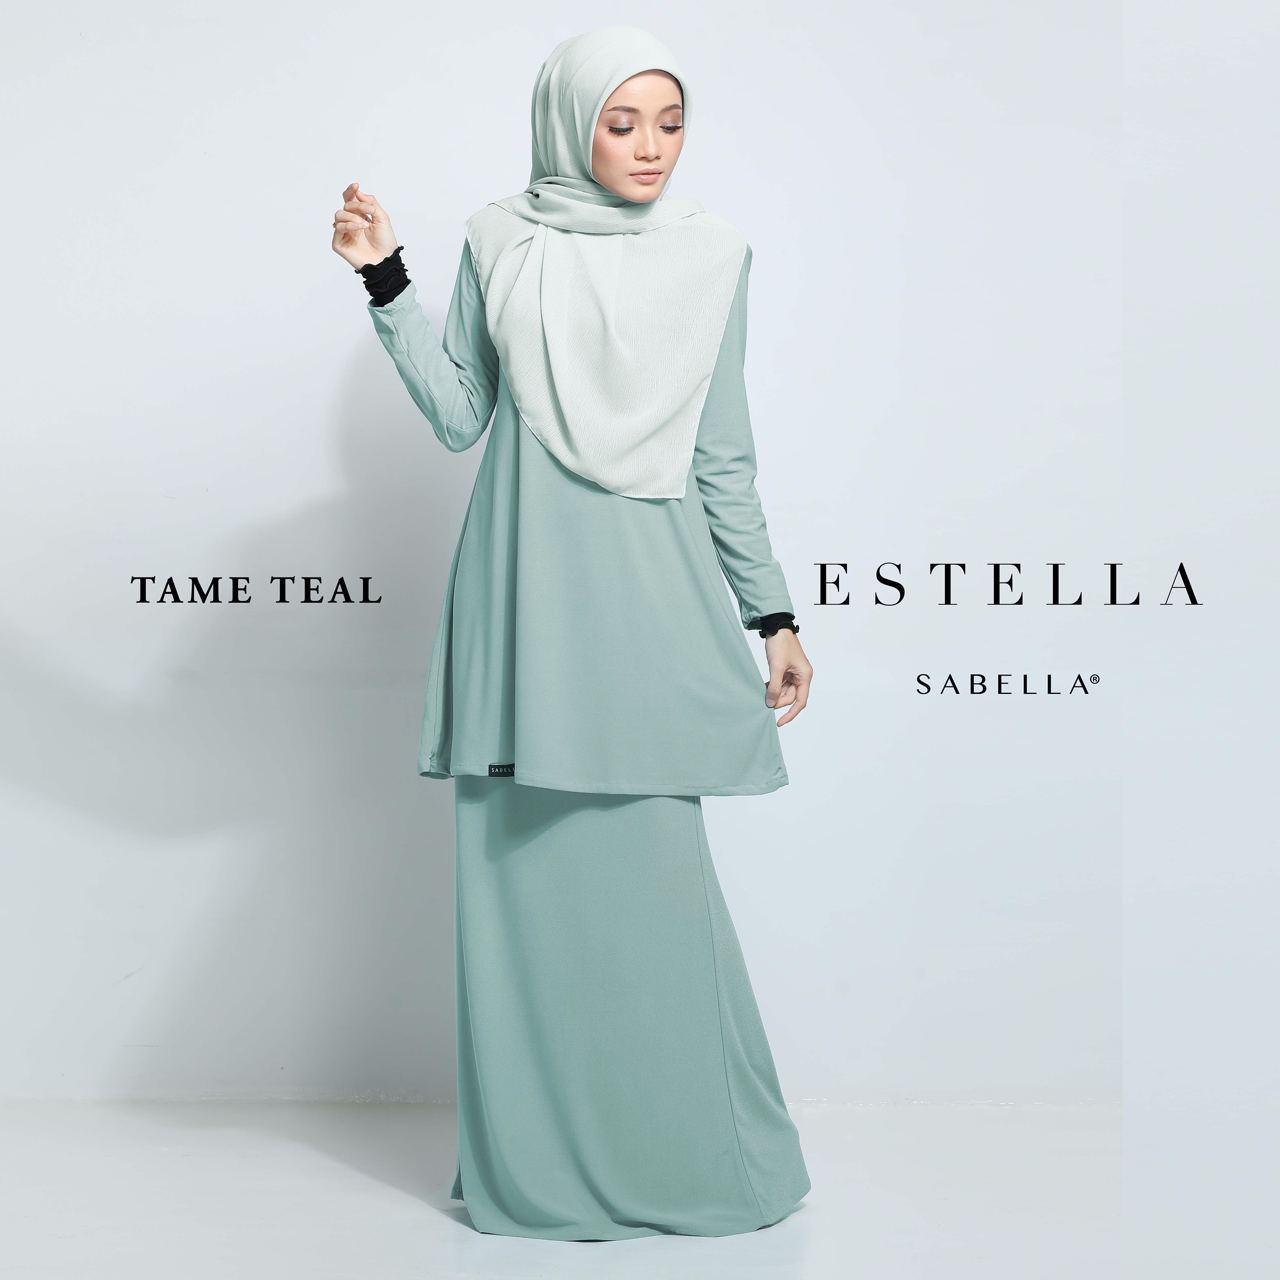 Estella 2.0 Tame teal (R)